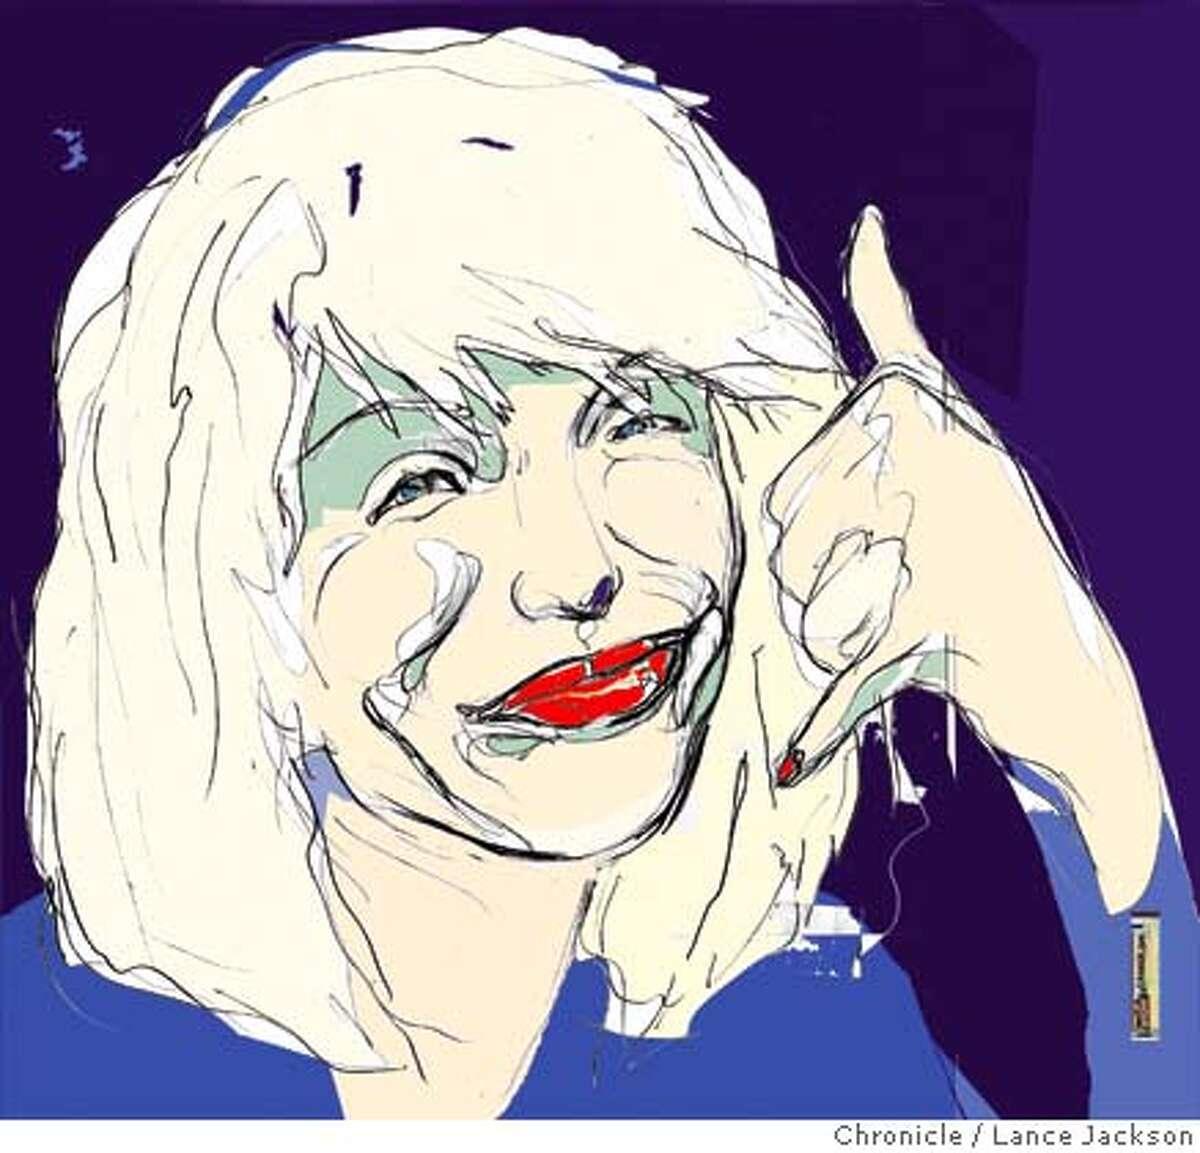 Illustration By Lance Jackson Datebook 1st of three sketch protraits of Courtney Love